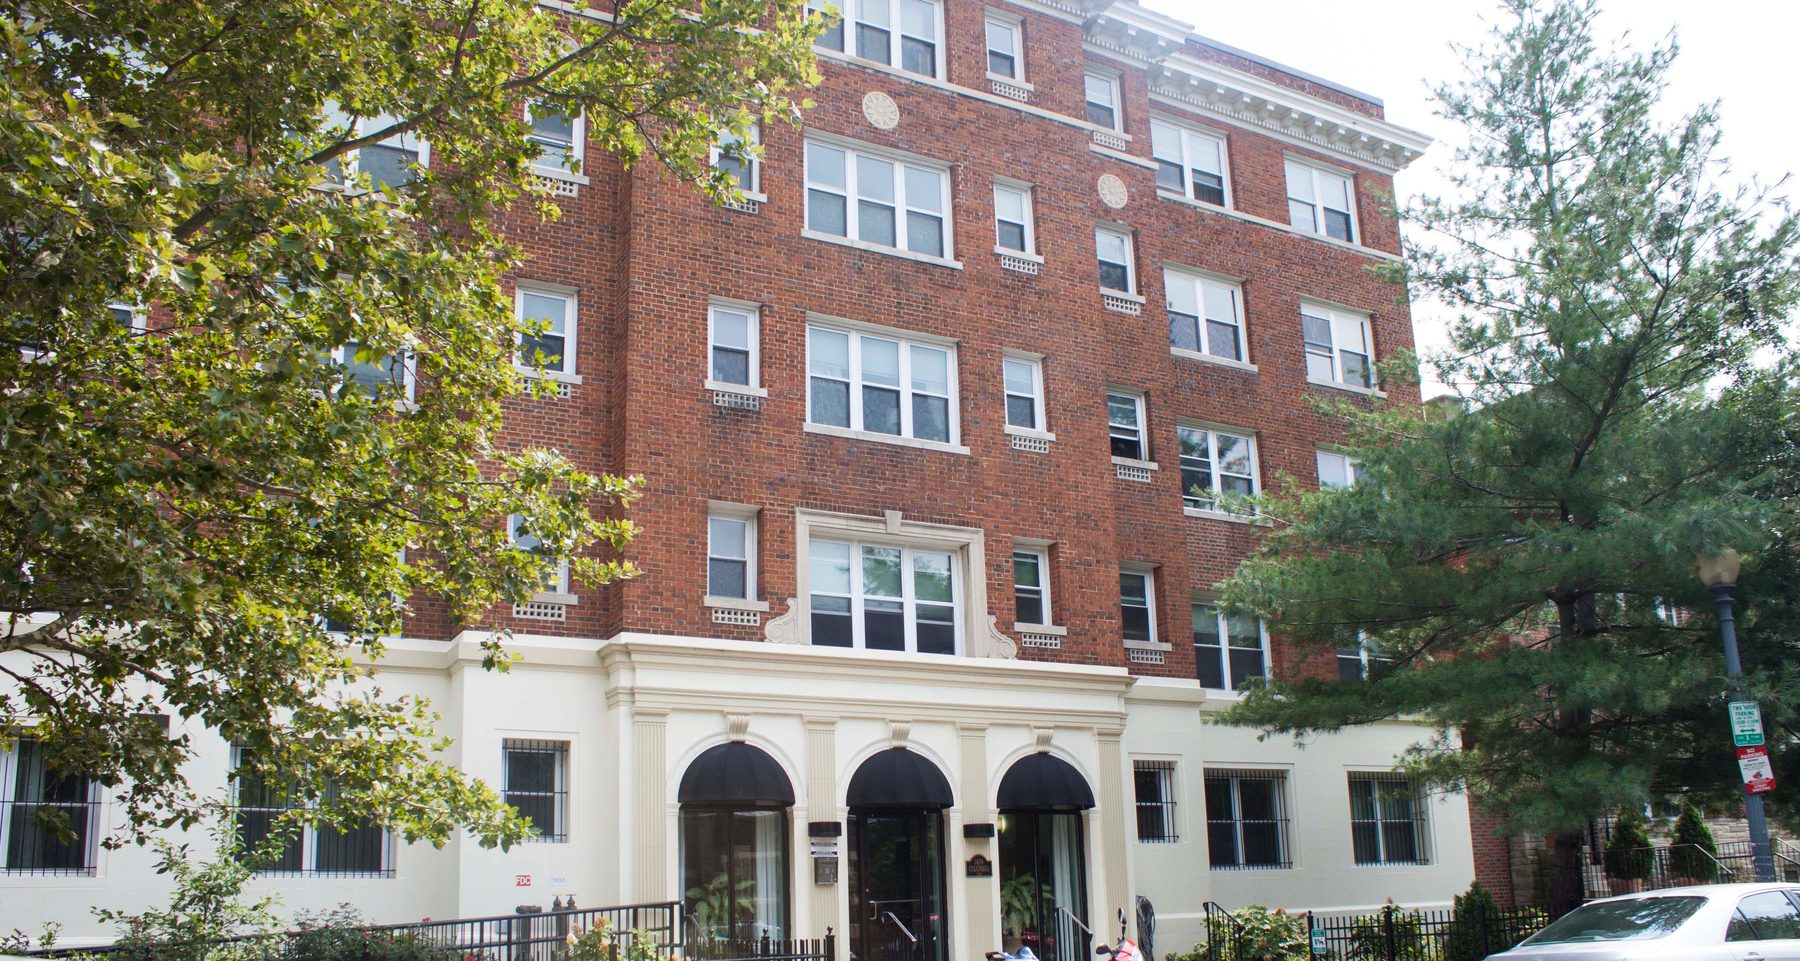 Condominium for Sale at 1458 Columbia Road Nw 110, Washington Washington, District Of Columbia 20009 United States